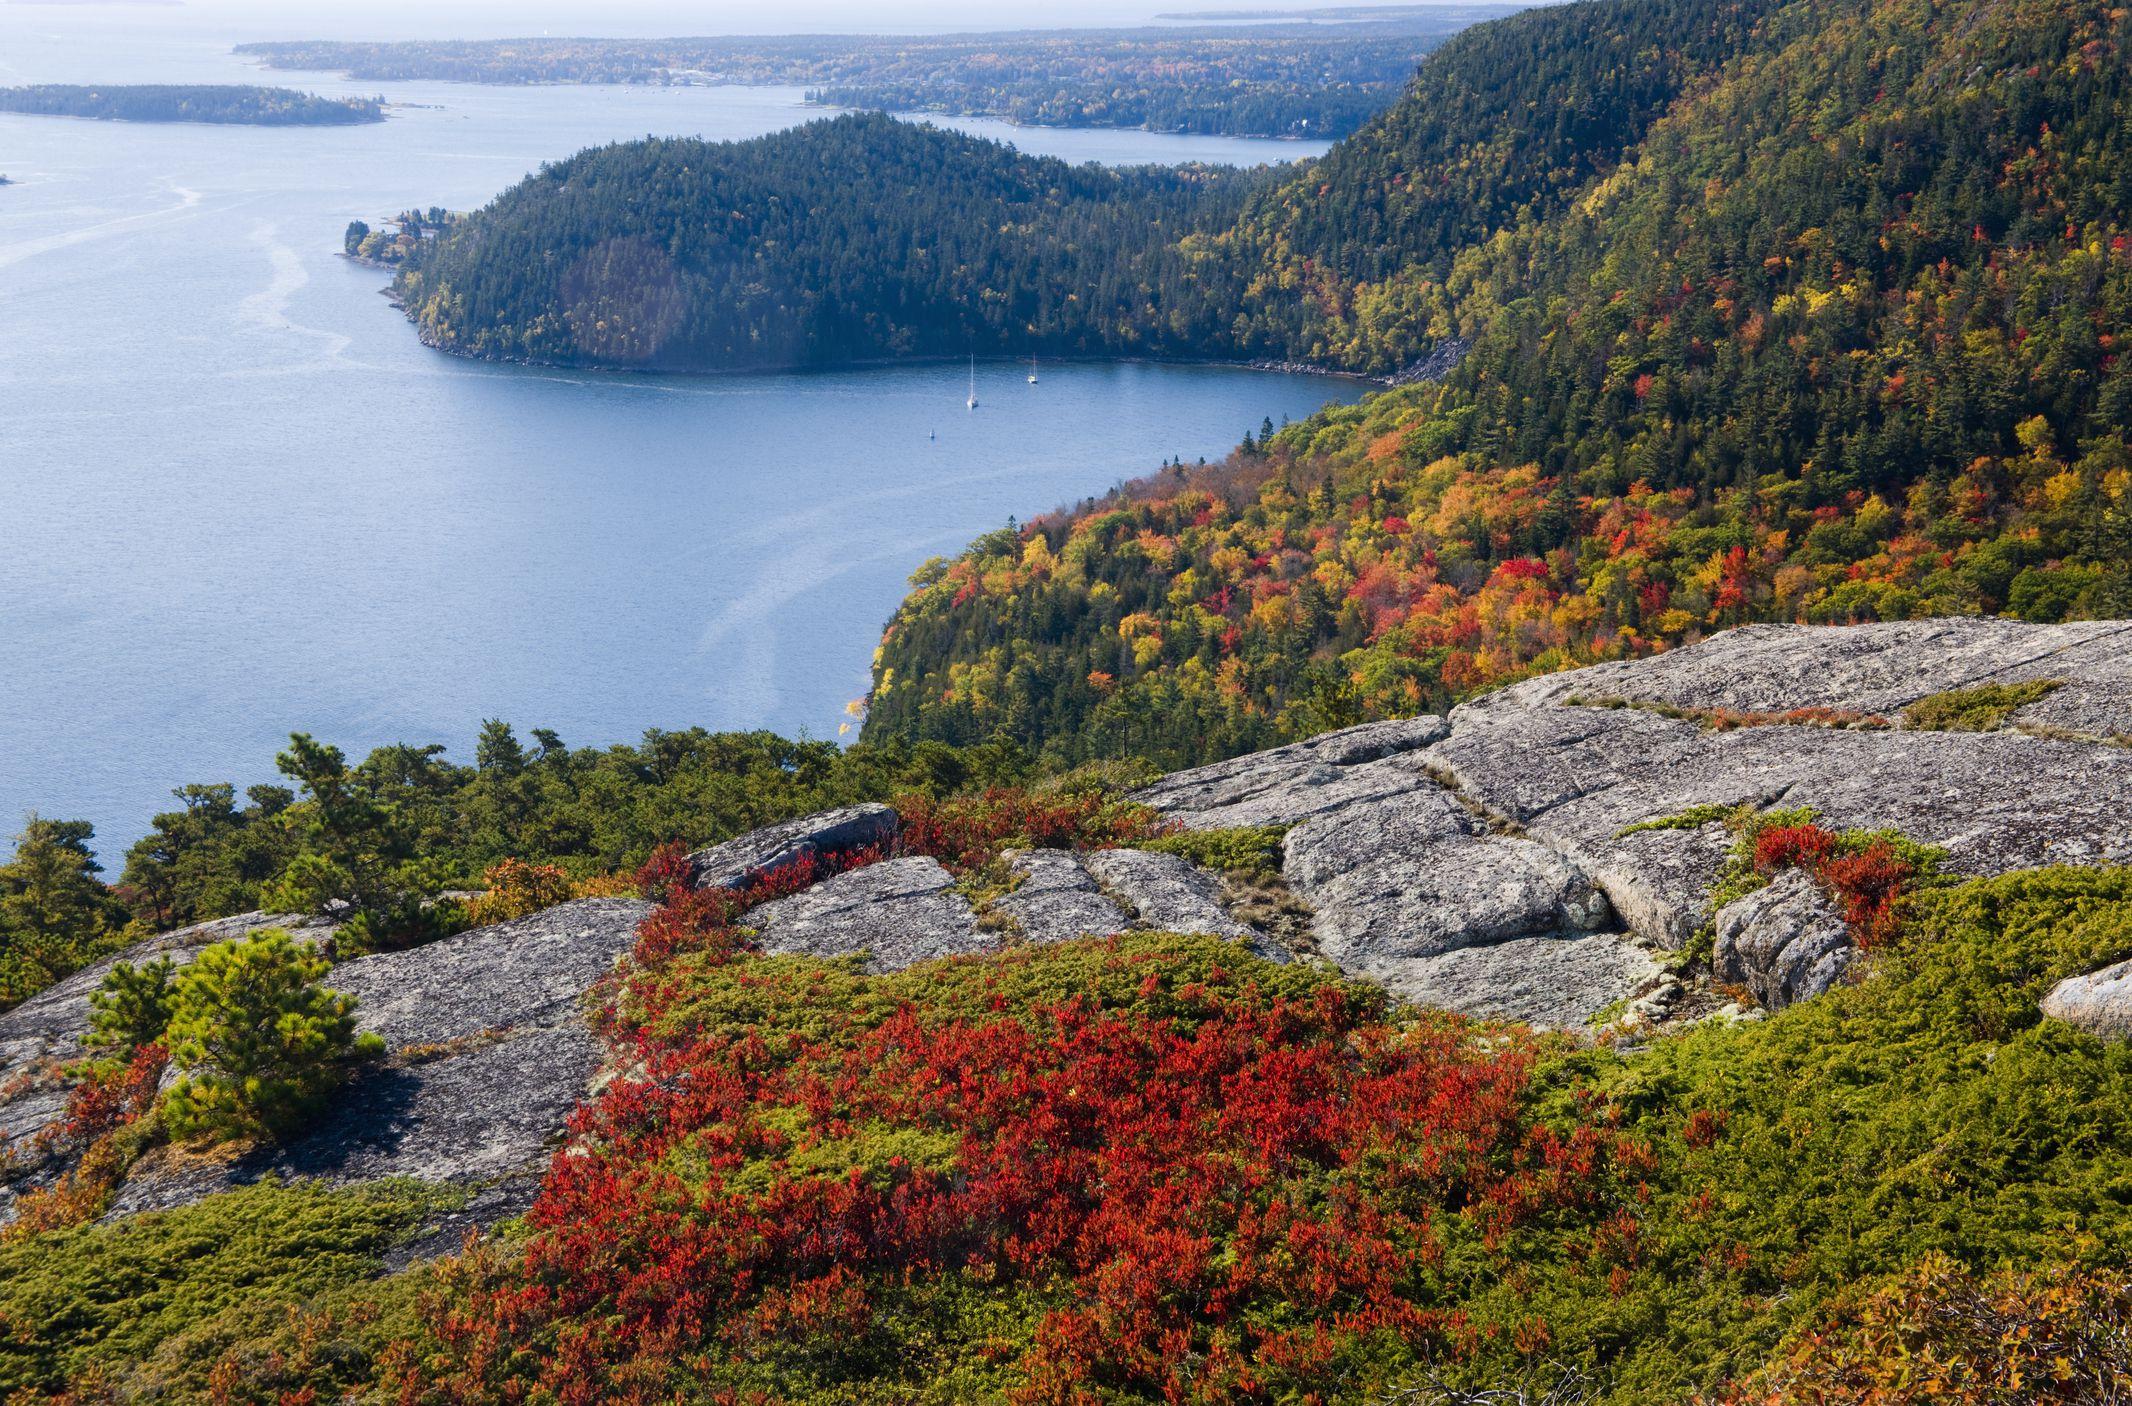 Acadia National Park in full atumn colors